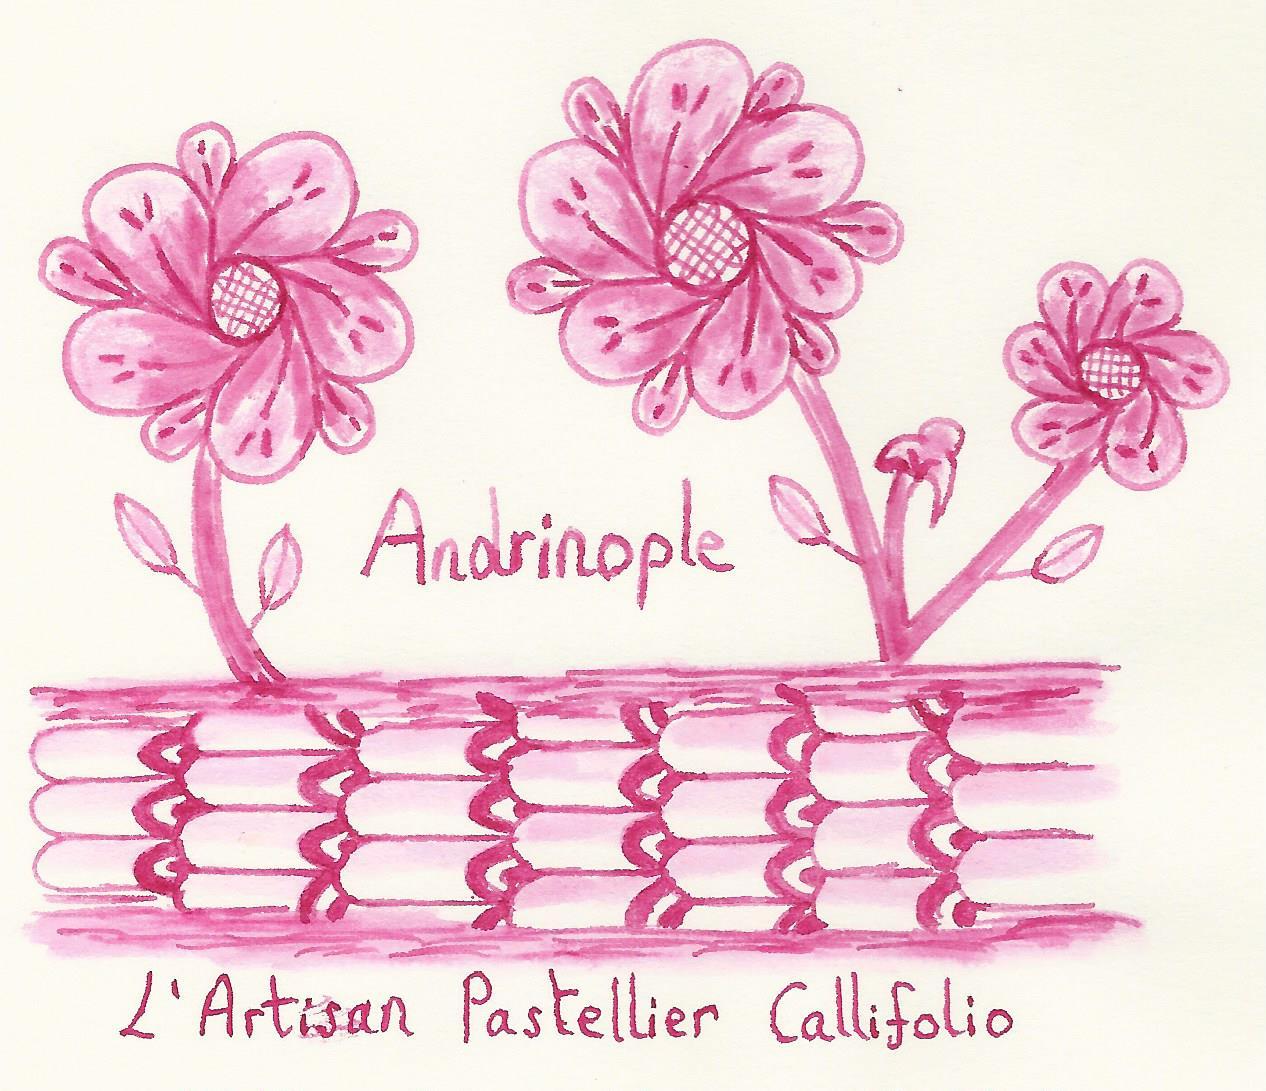 fpn_1483987402__callifolio_-_andrinople_